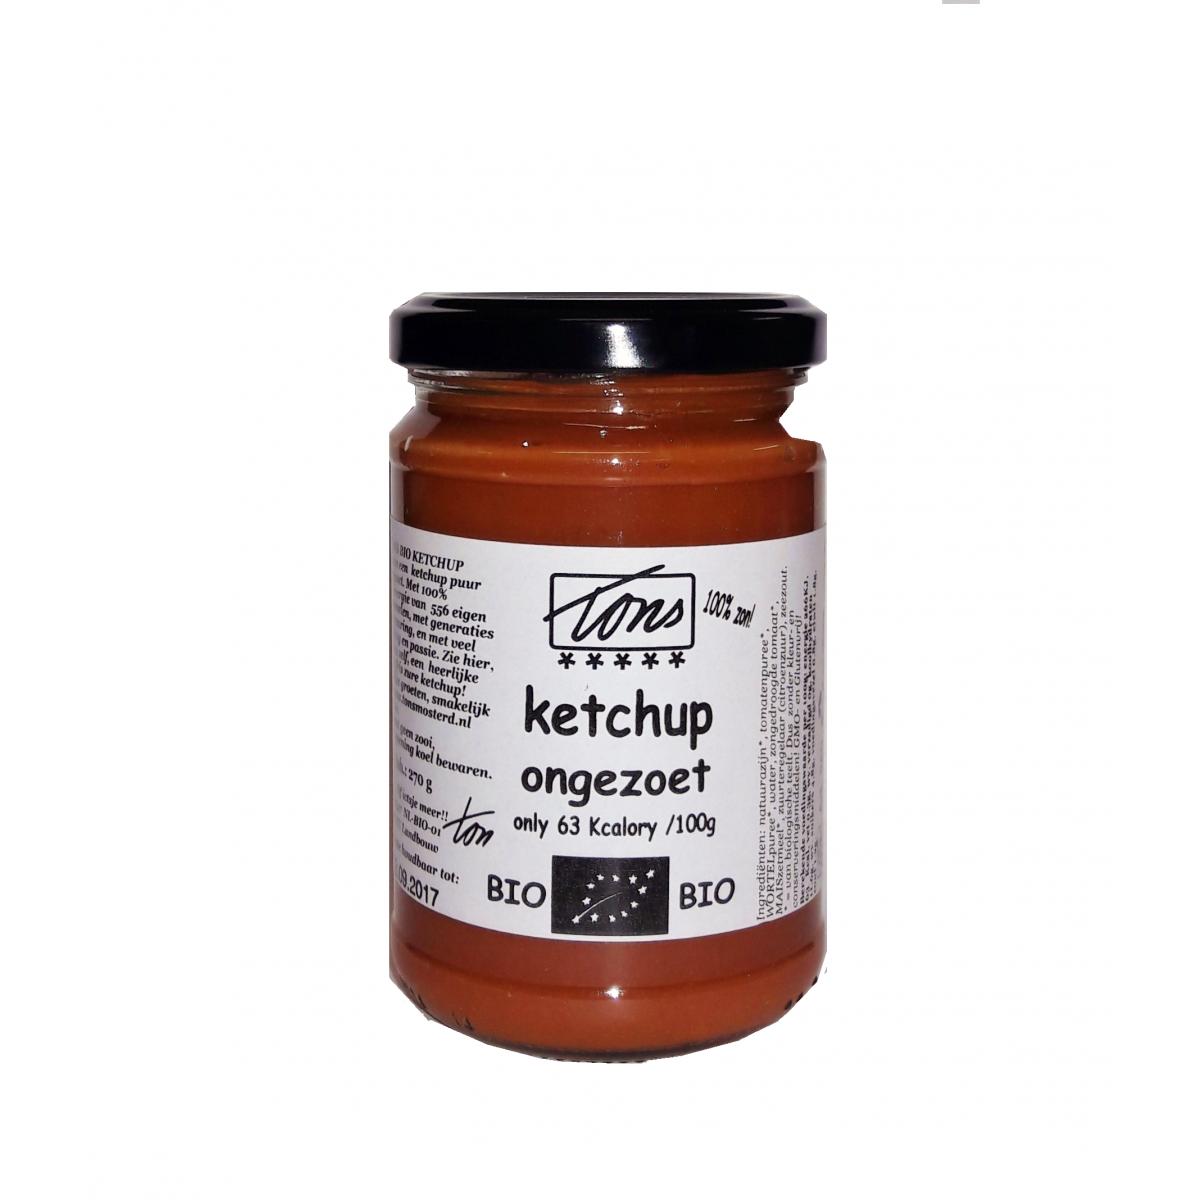 Ketchup Ongezoet